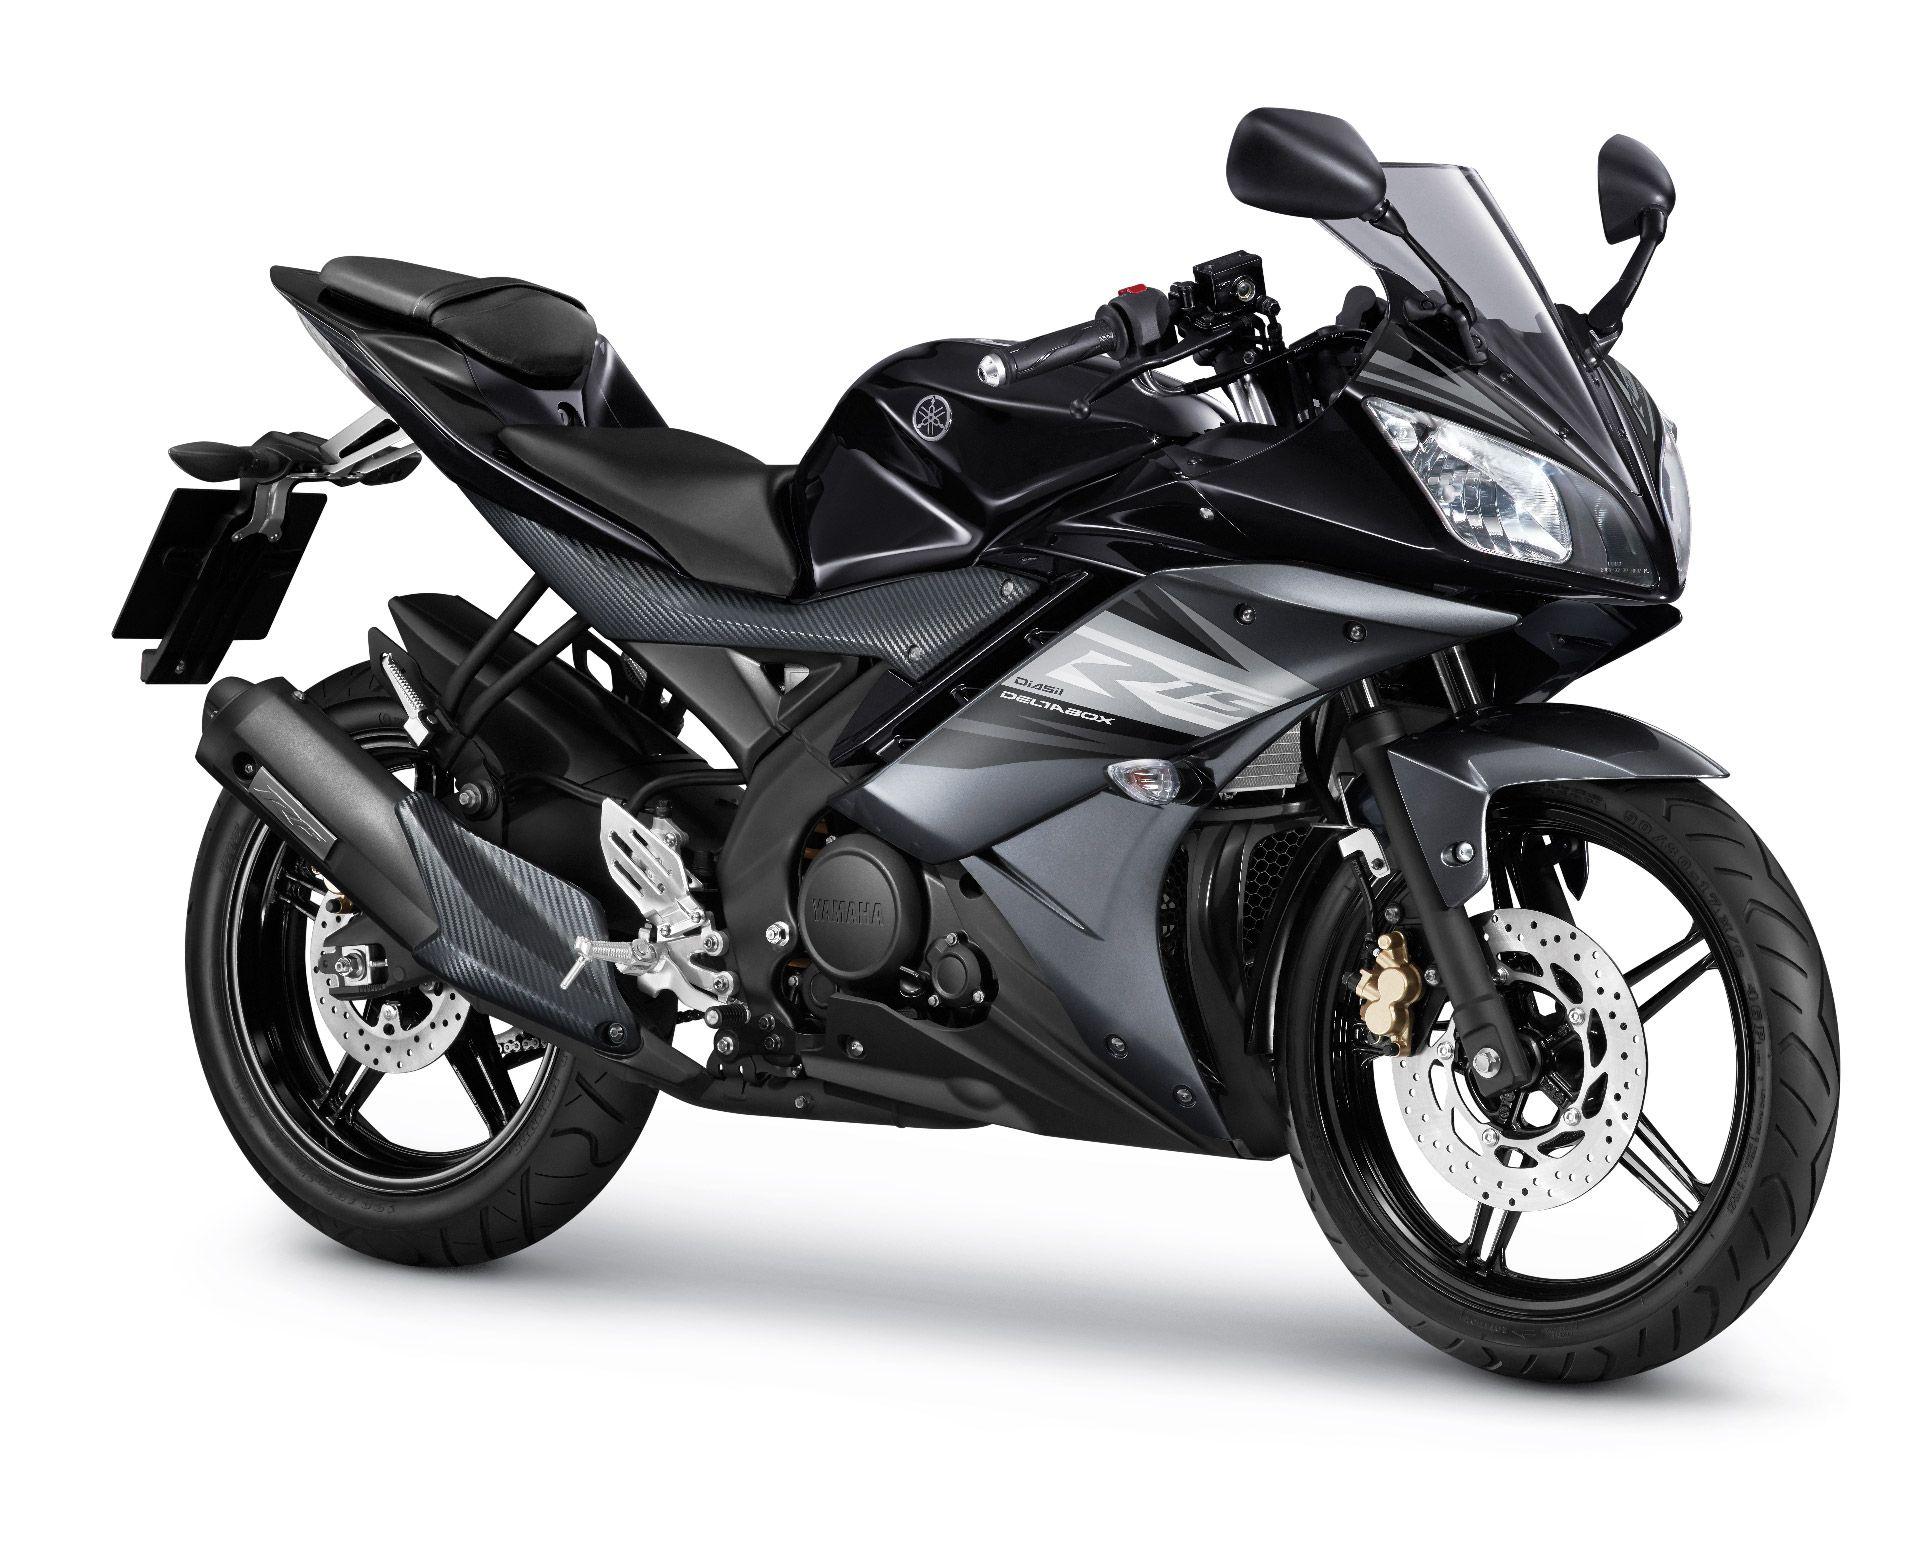 Yamaha Yzf R15 Black 2014 Yamaha Yzf Motorcycles In India